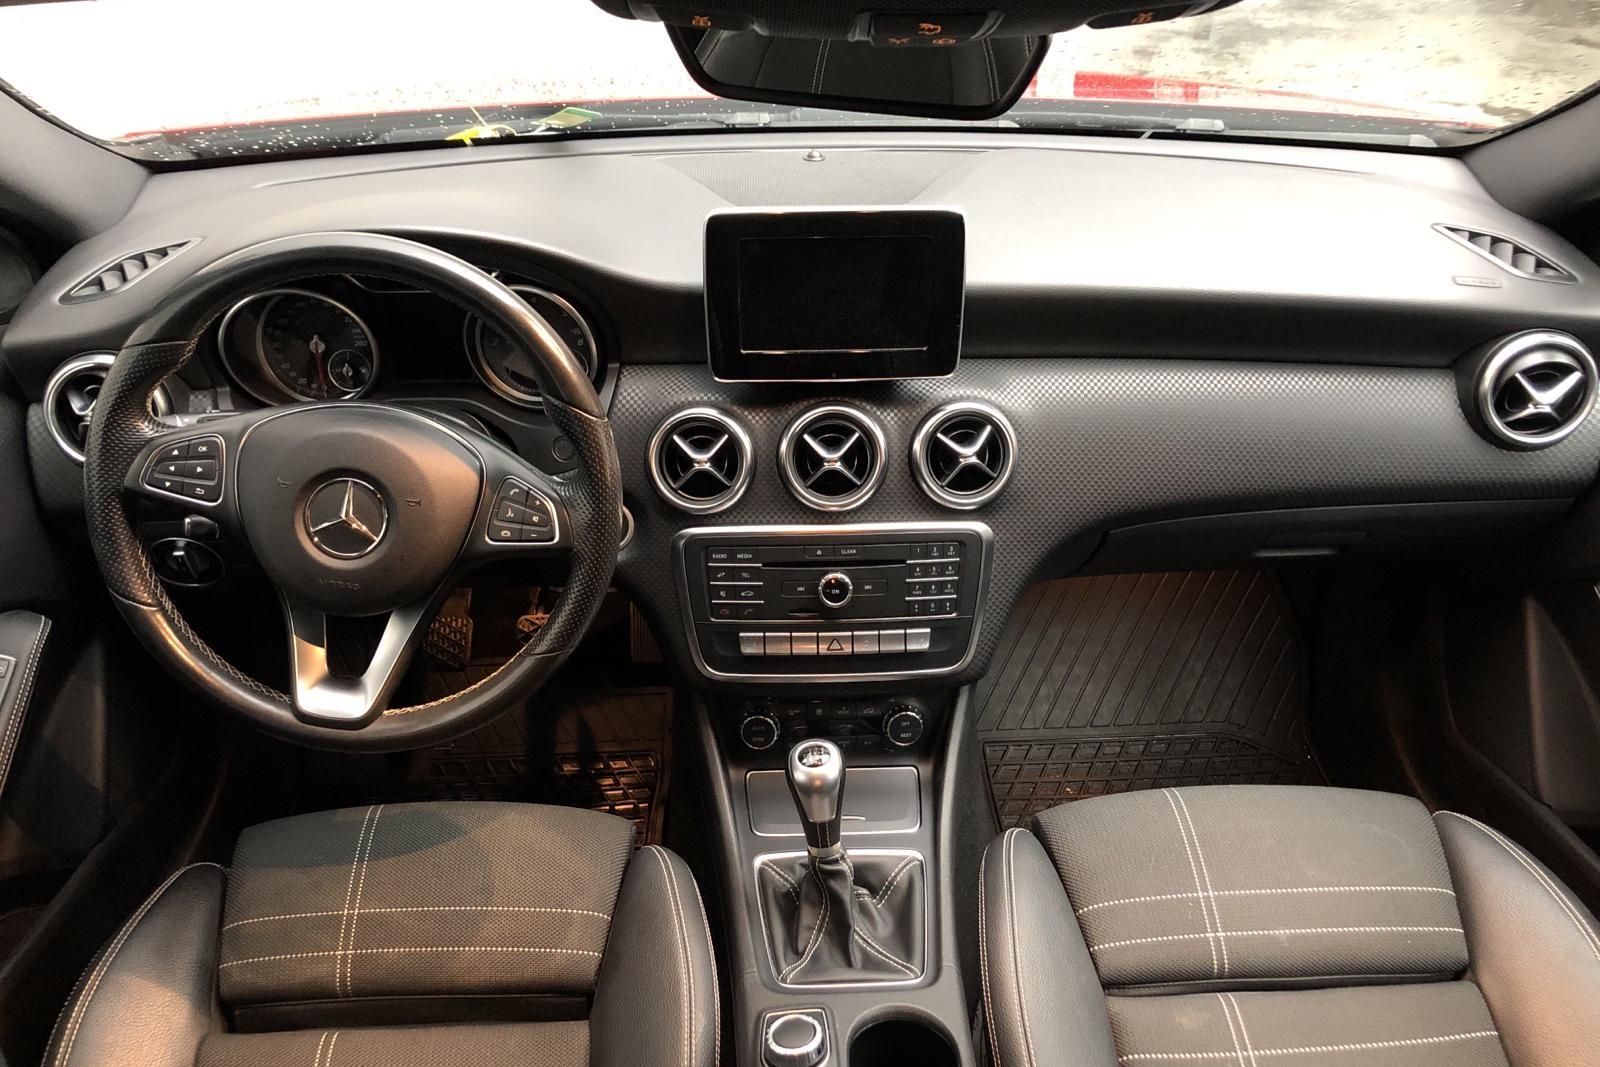 Mercedes A 180 CDI 5dr W176 (109hk) - 85 660 km - Manual - red - 2016